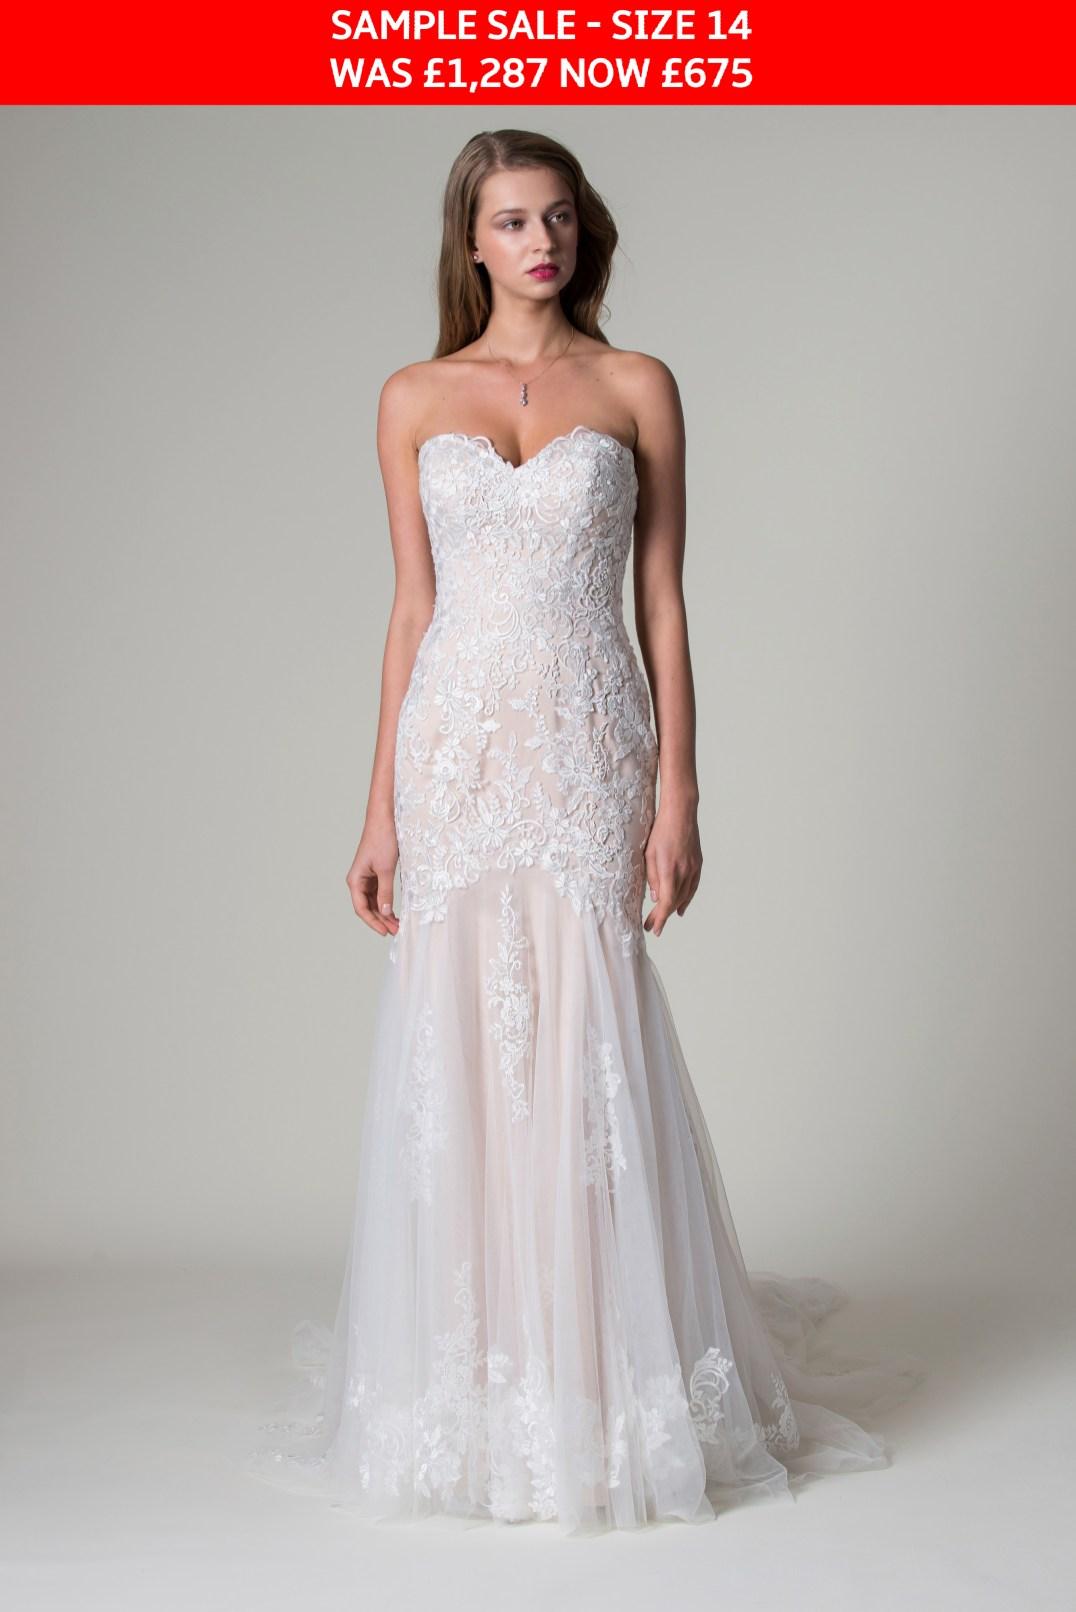 MiaMia Paulina wedding gown sample sale